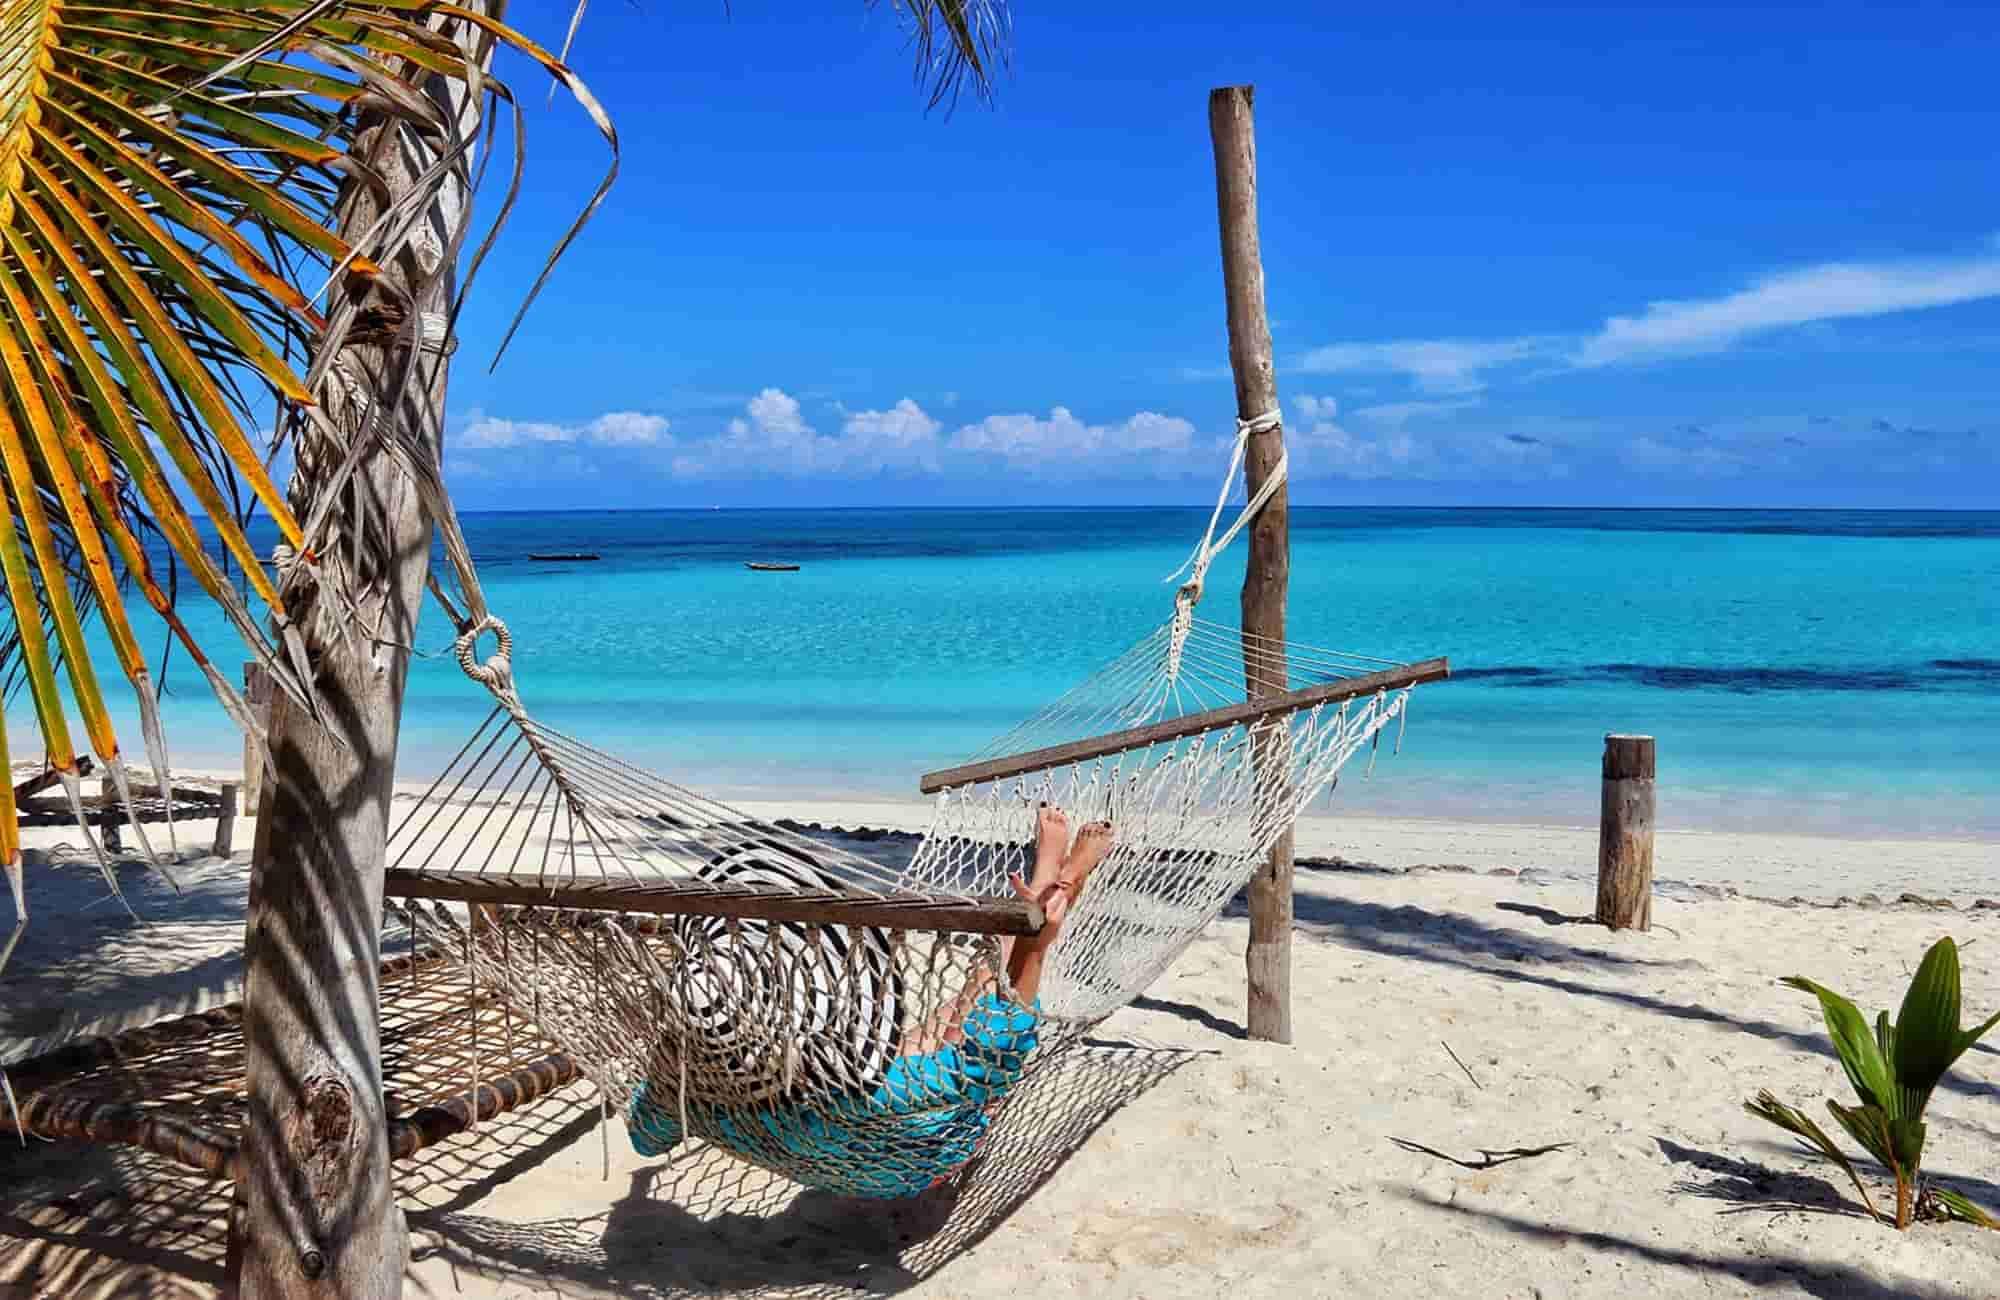 Voyage en Tanzanie - Zanzibar - Amplitudes